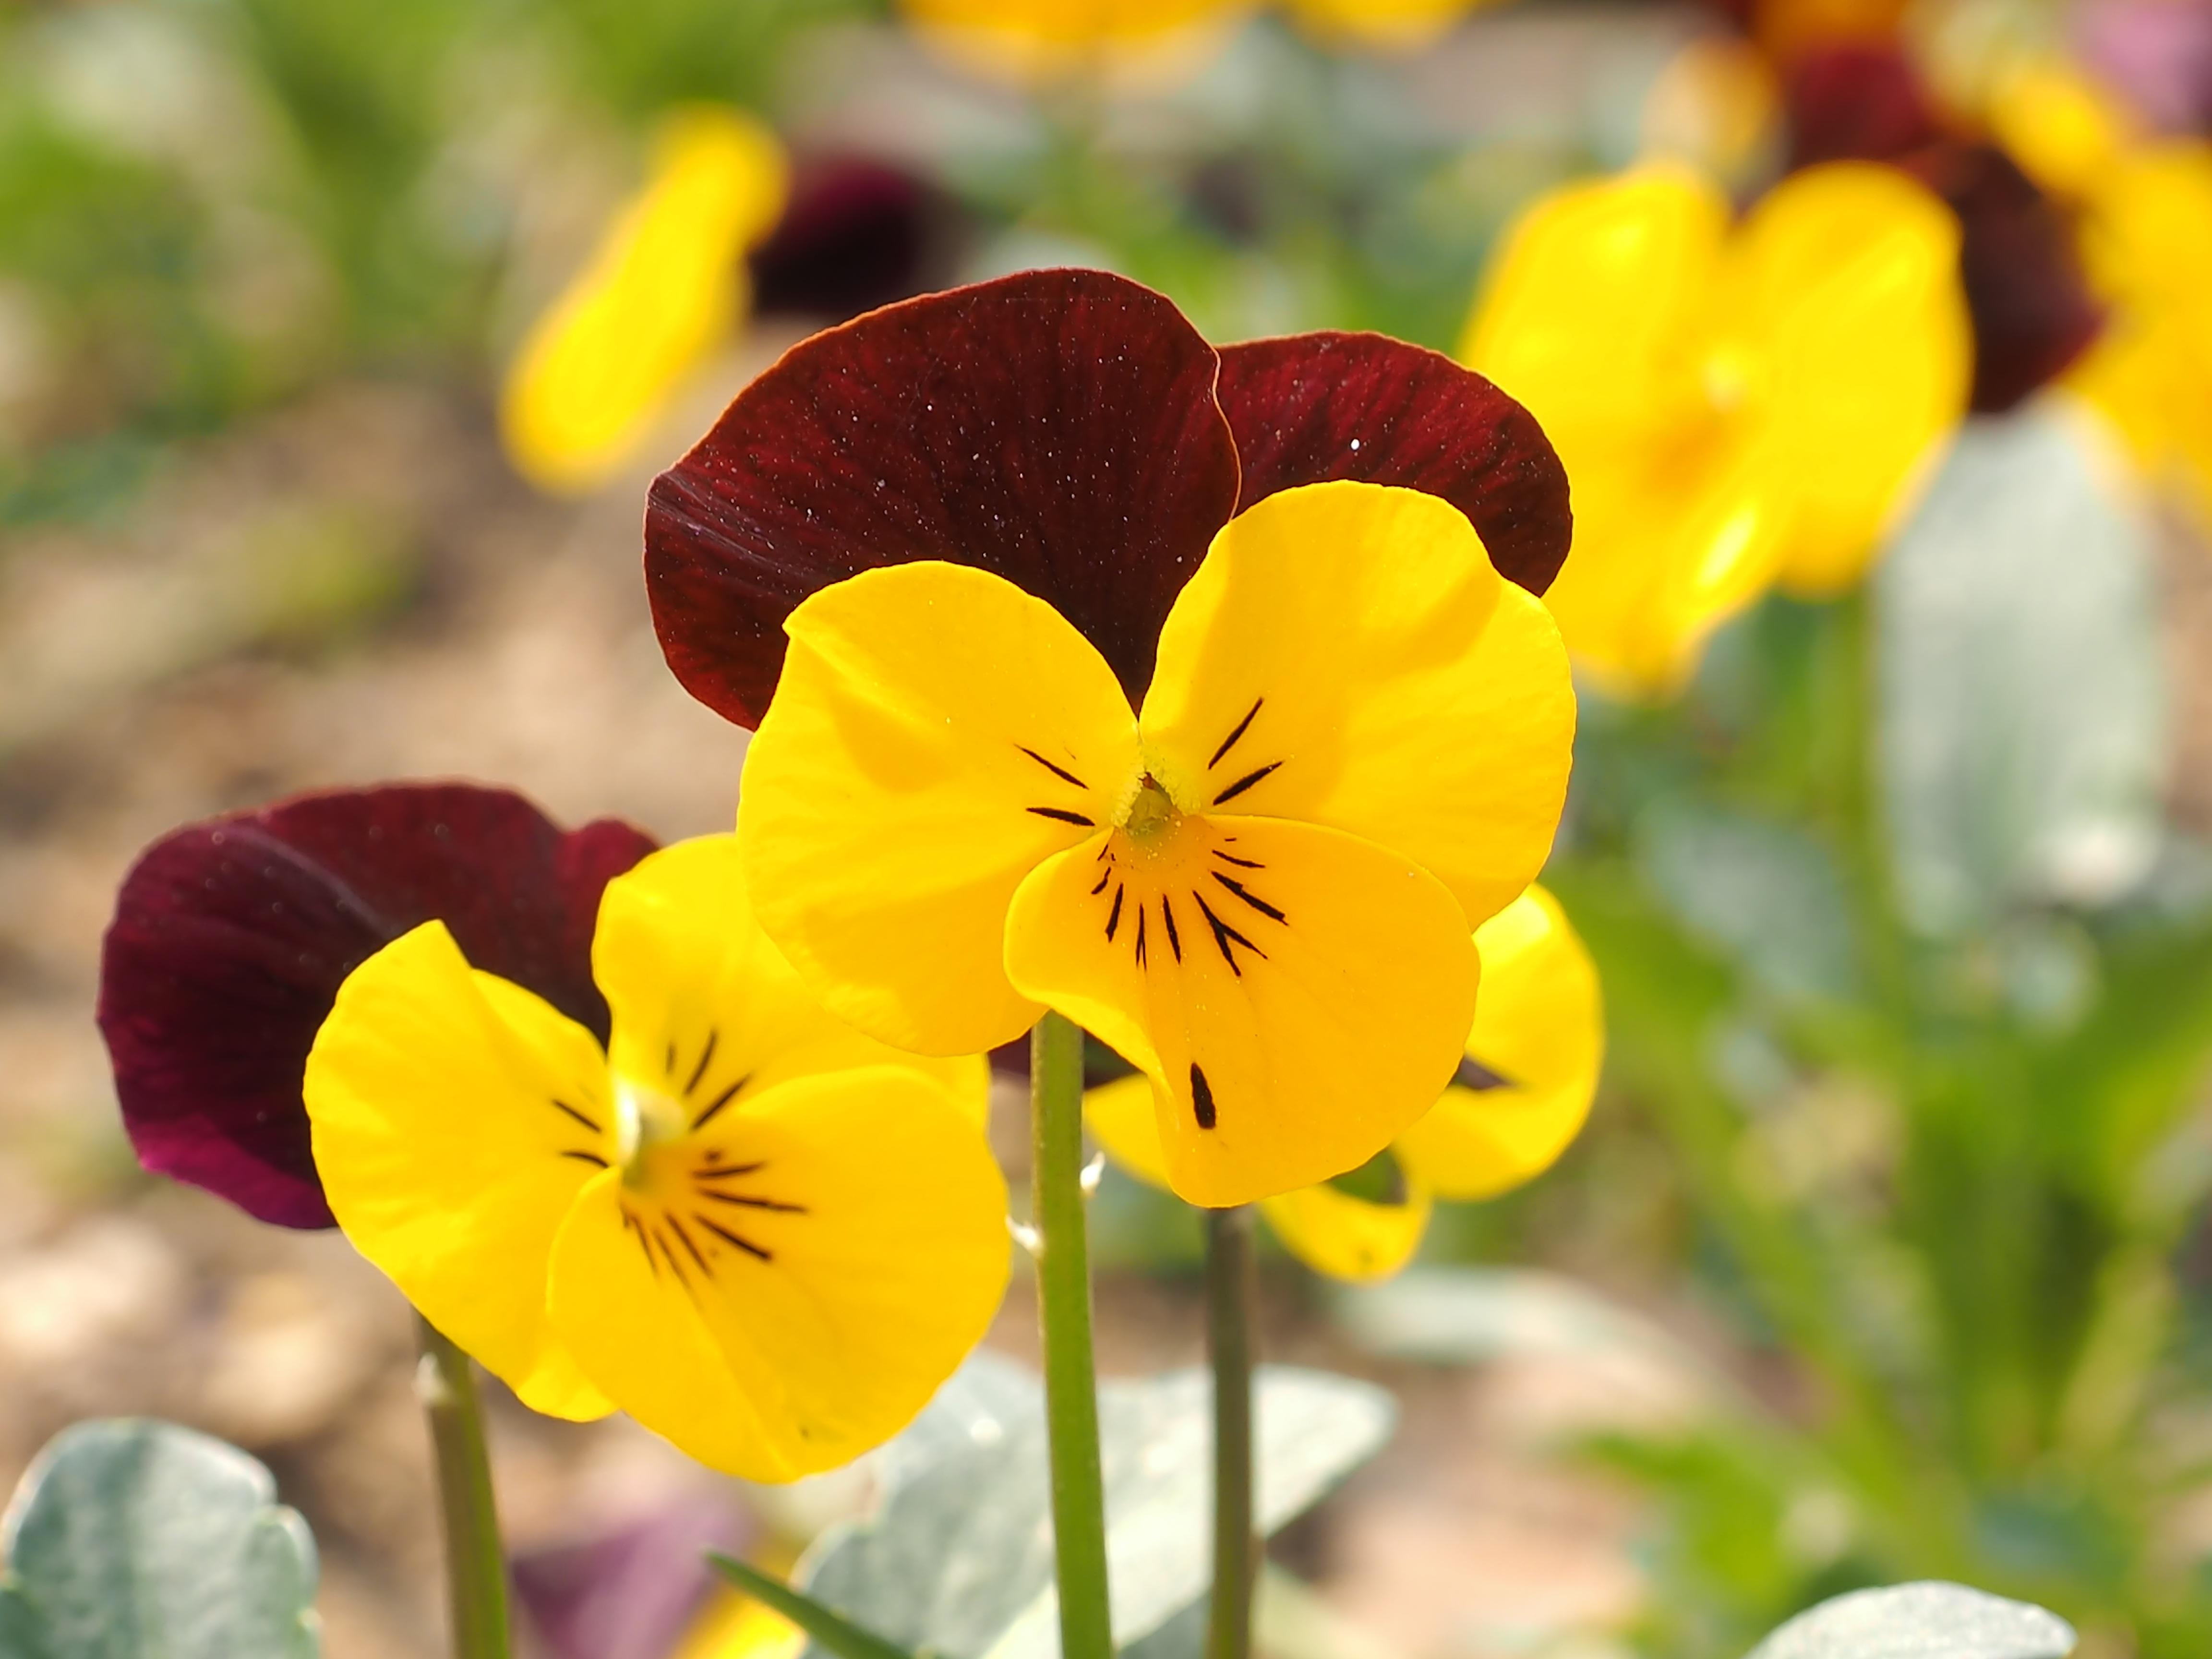 kostenlose foto bl tenblatt fr hling botanik gelb flora pflanzen gelbe blume wildblume. Black Bedroom Furniture Sets. Home Design Ideas